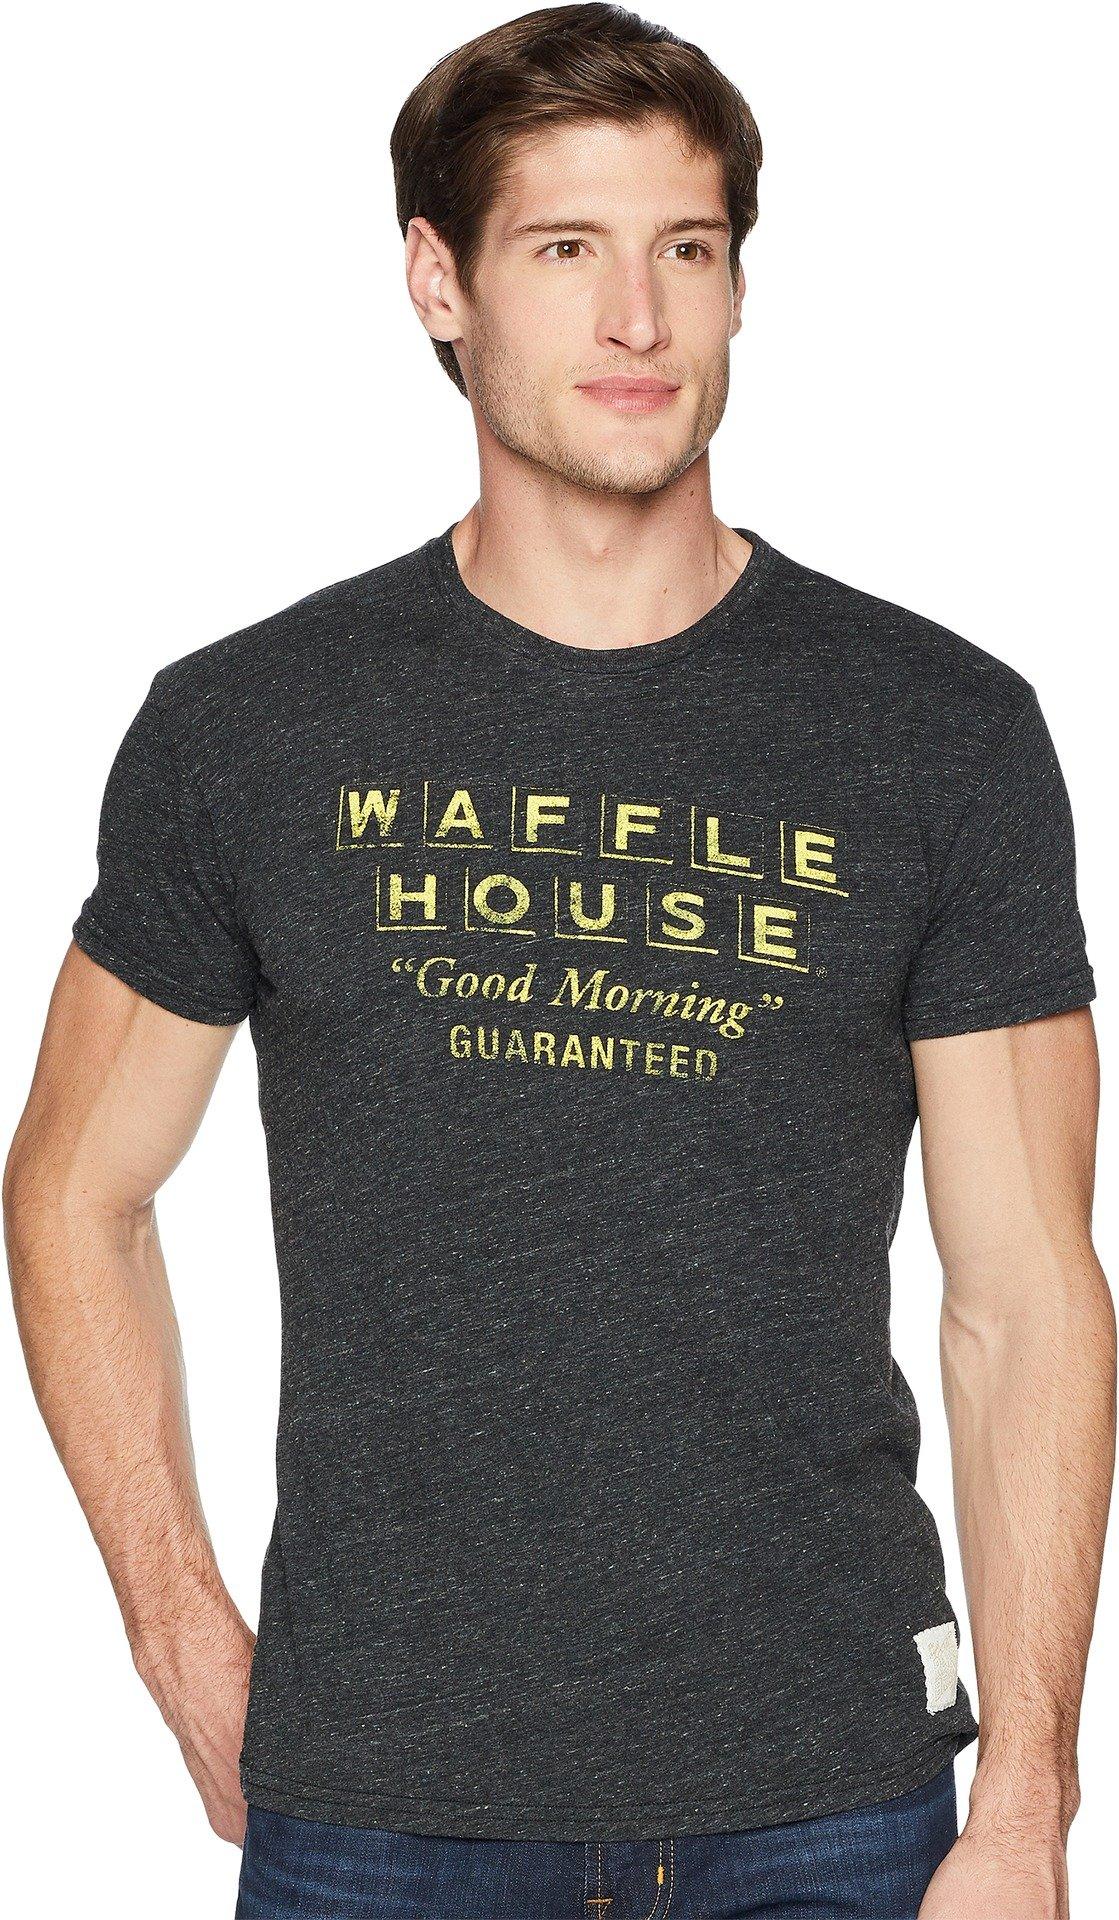 Original Retro Brand The Men's Short Sleeve Vintage Tri-Blend Waffle House Tee Streaky Black Large